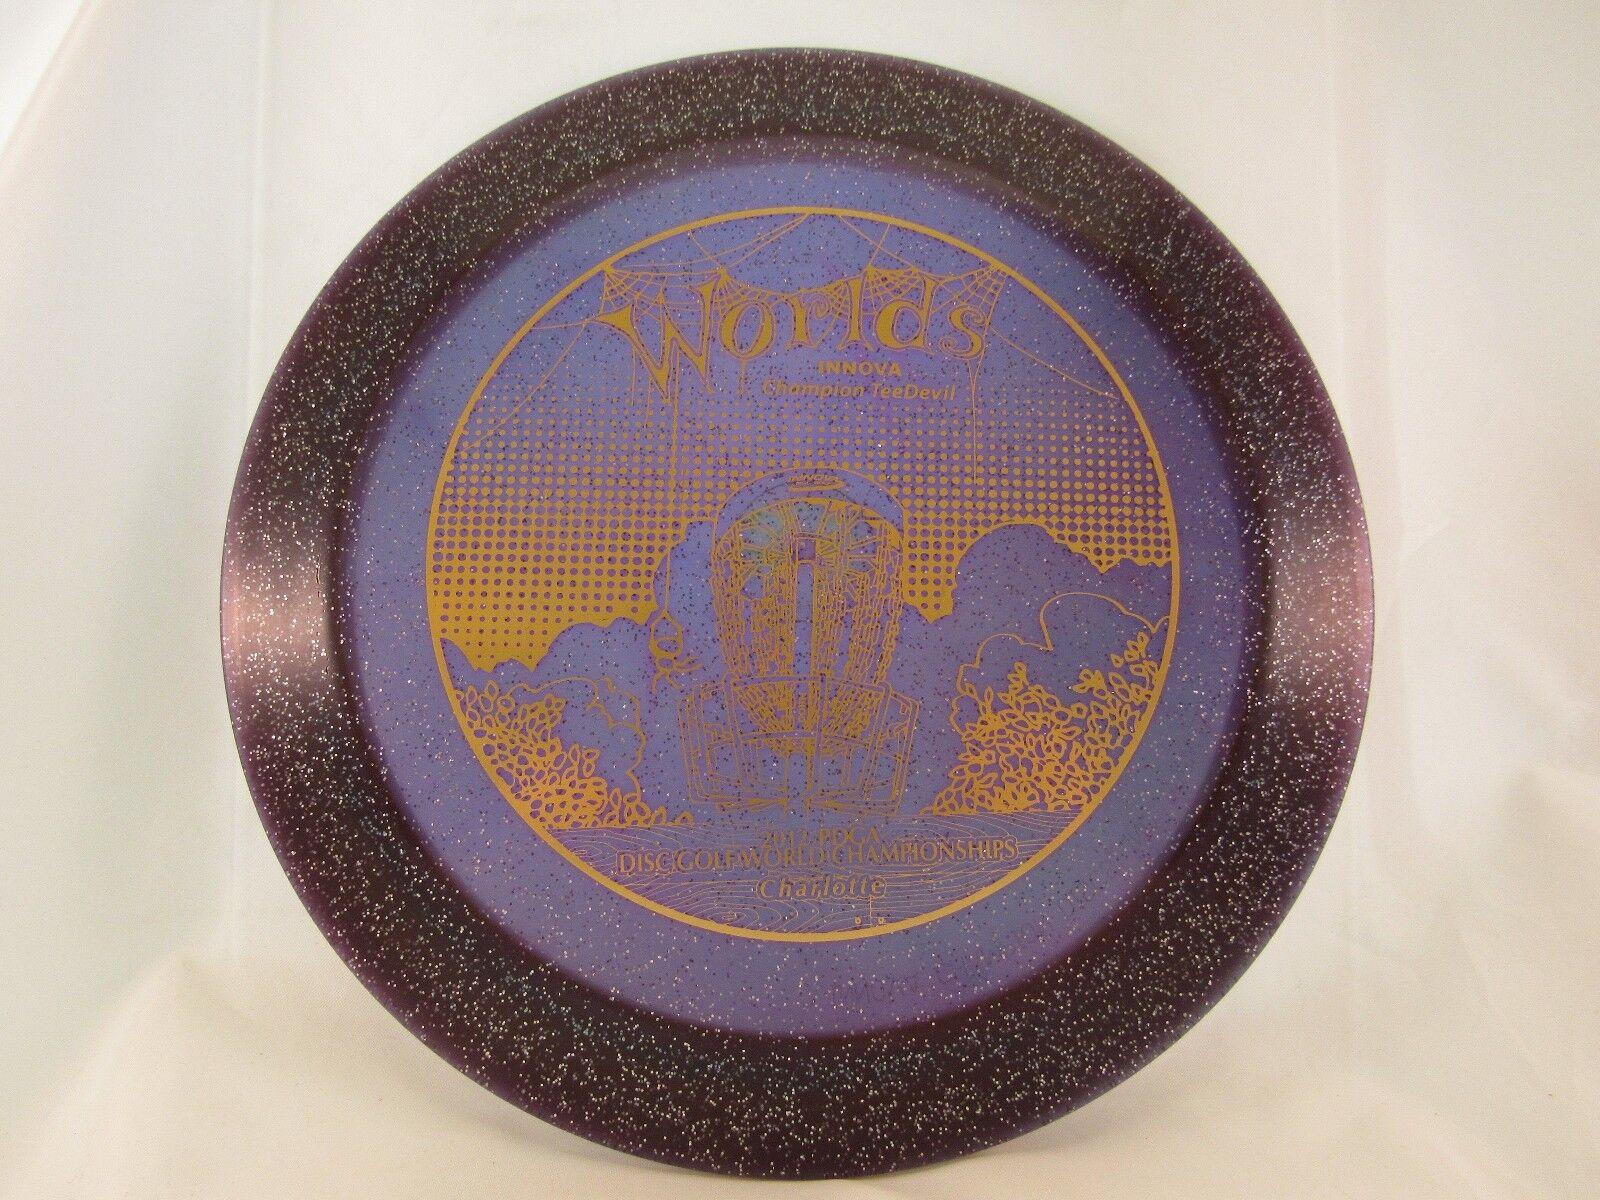 PRERELEASE INNOVA CHAMPION TEEDEVIL Purple gold 2012 Charlotte Worlds 171g -New